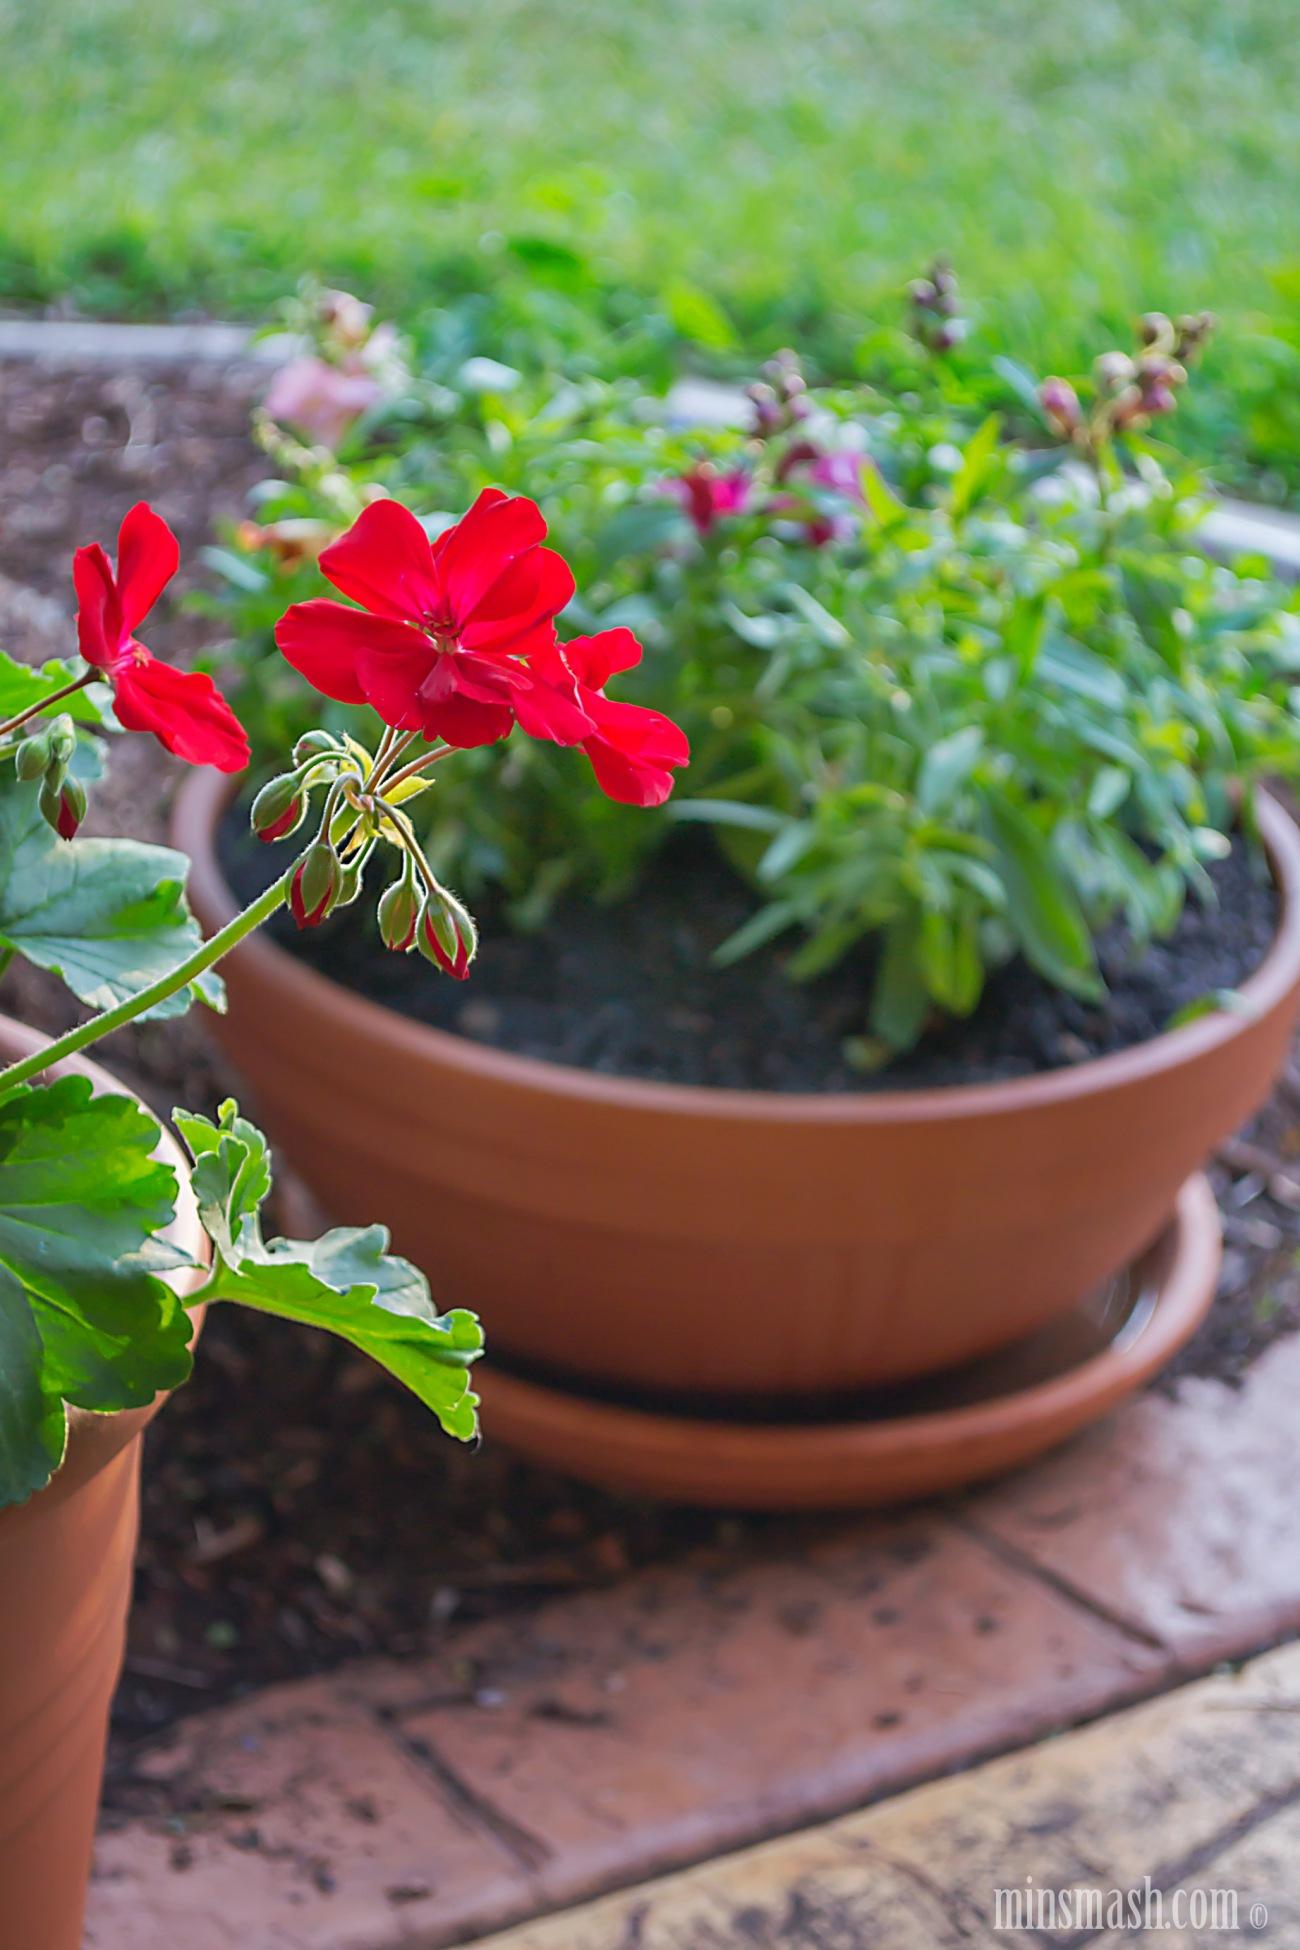 garden, pots, pot plants